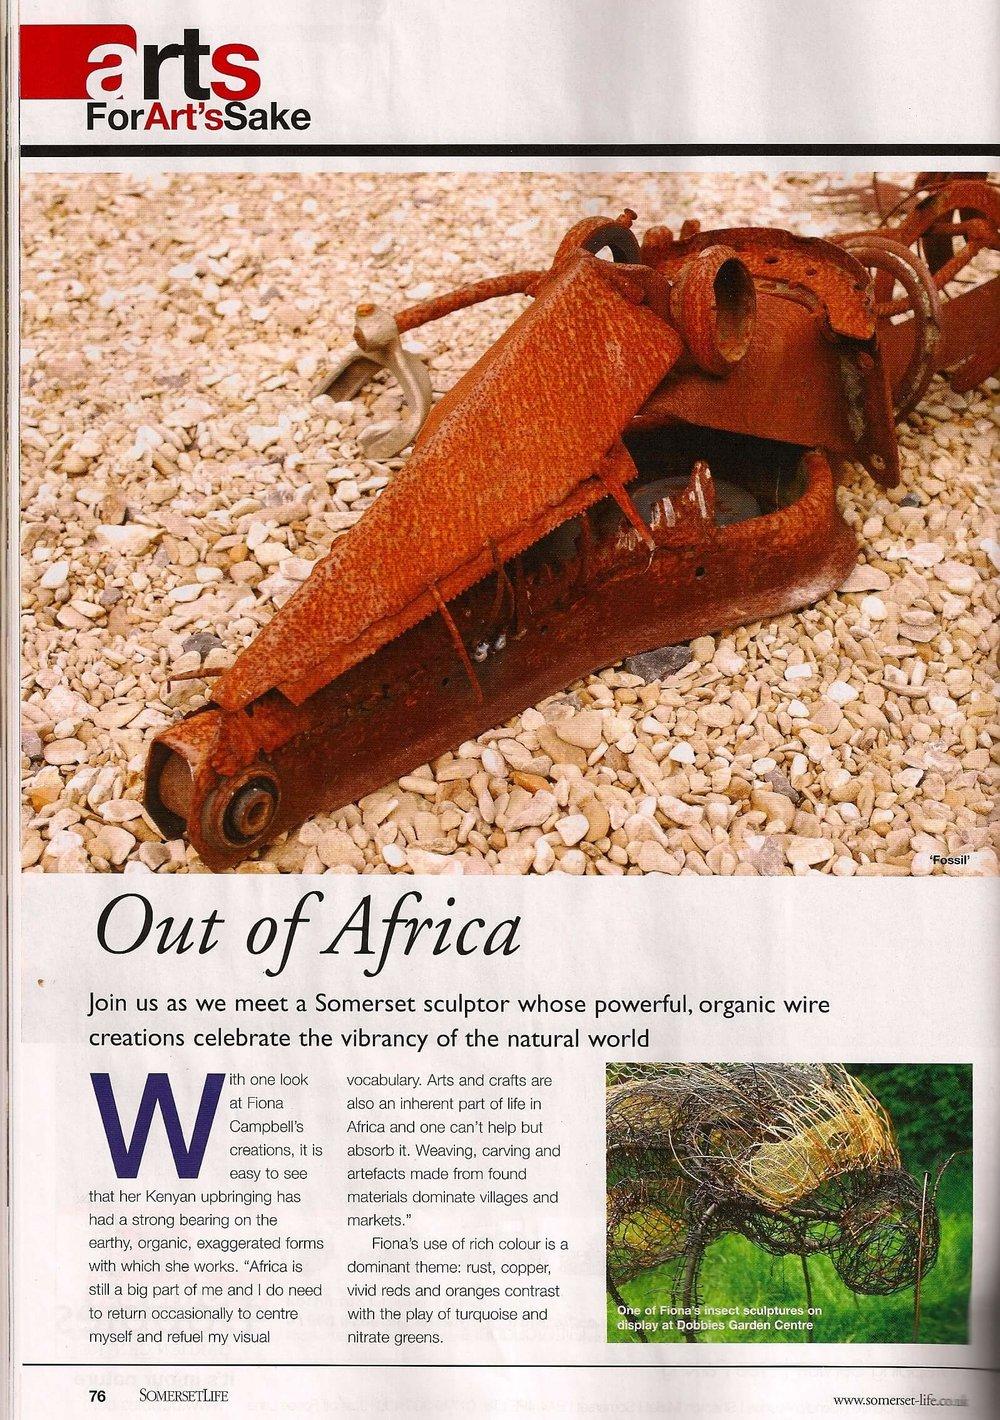 somerset-life-article-p-1-nov-09.jpg